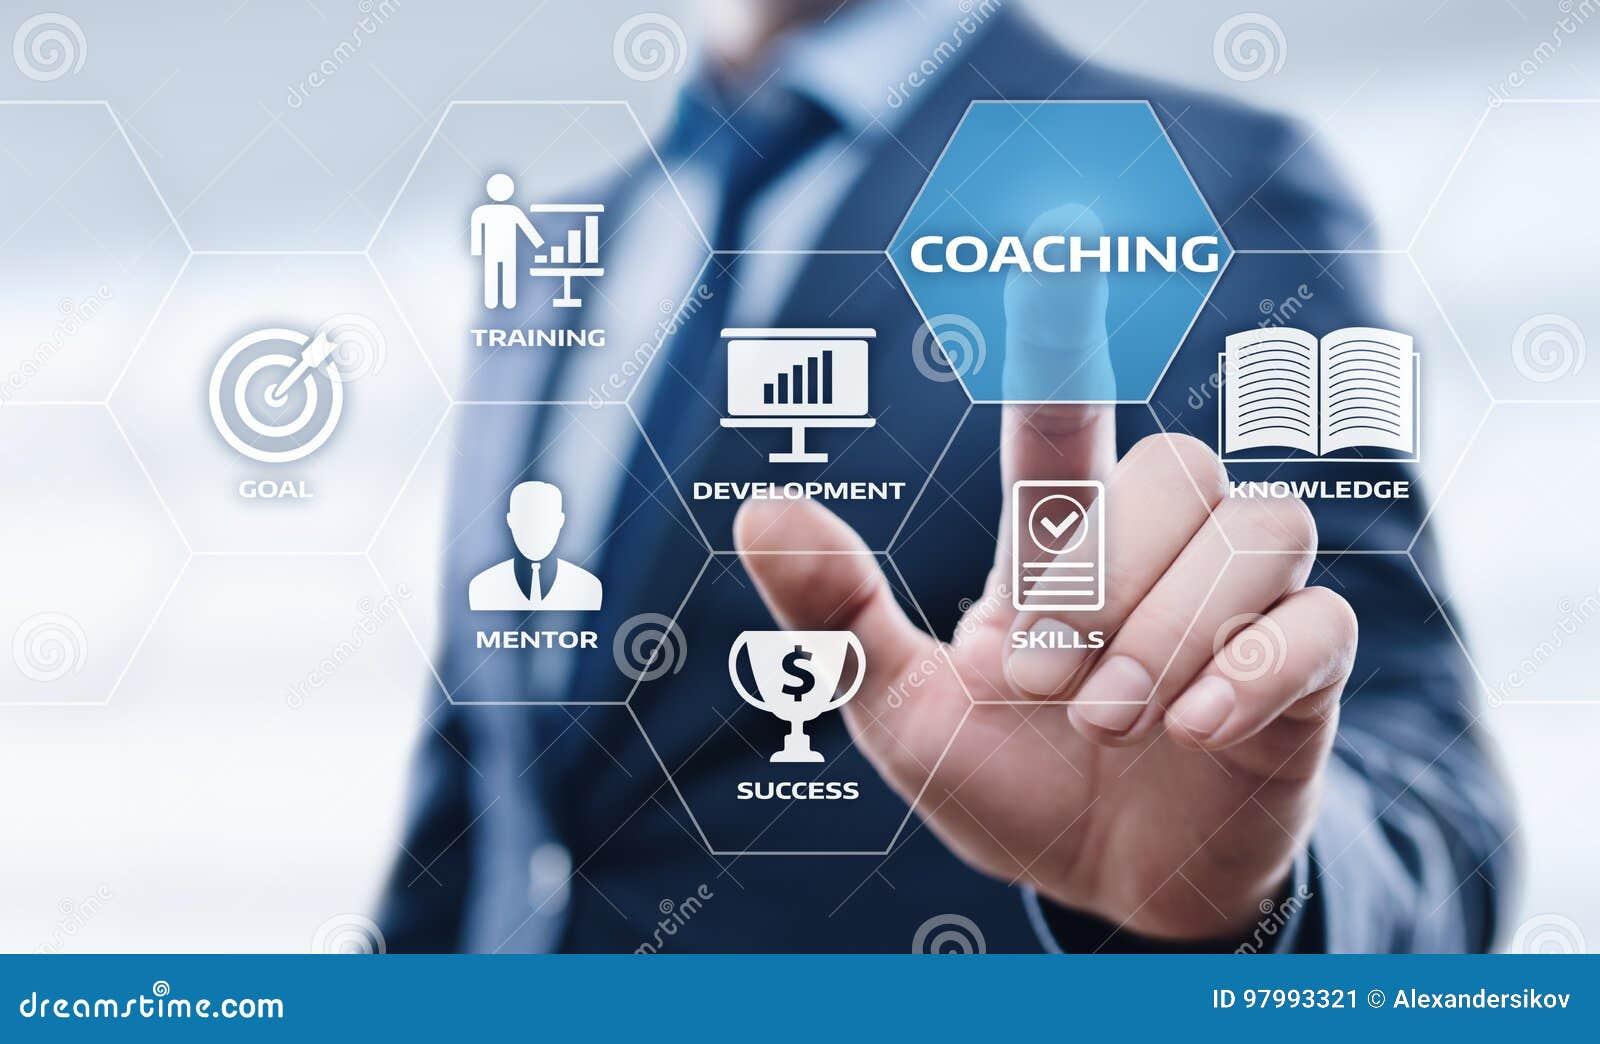 Coaching Mentoring Education Business Training Development E-learning Concept